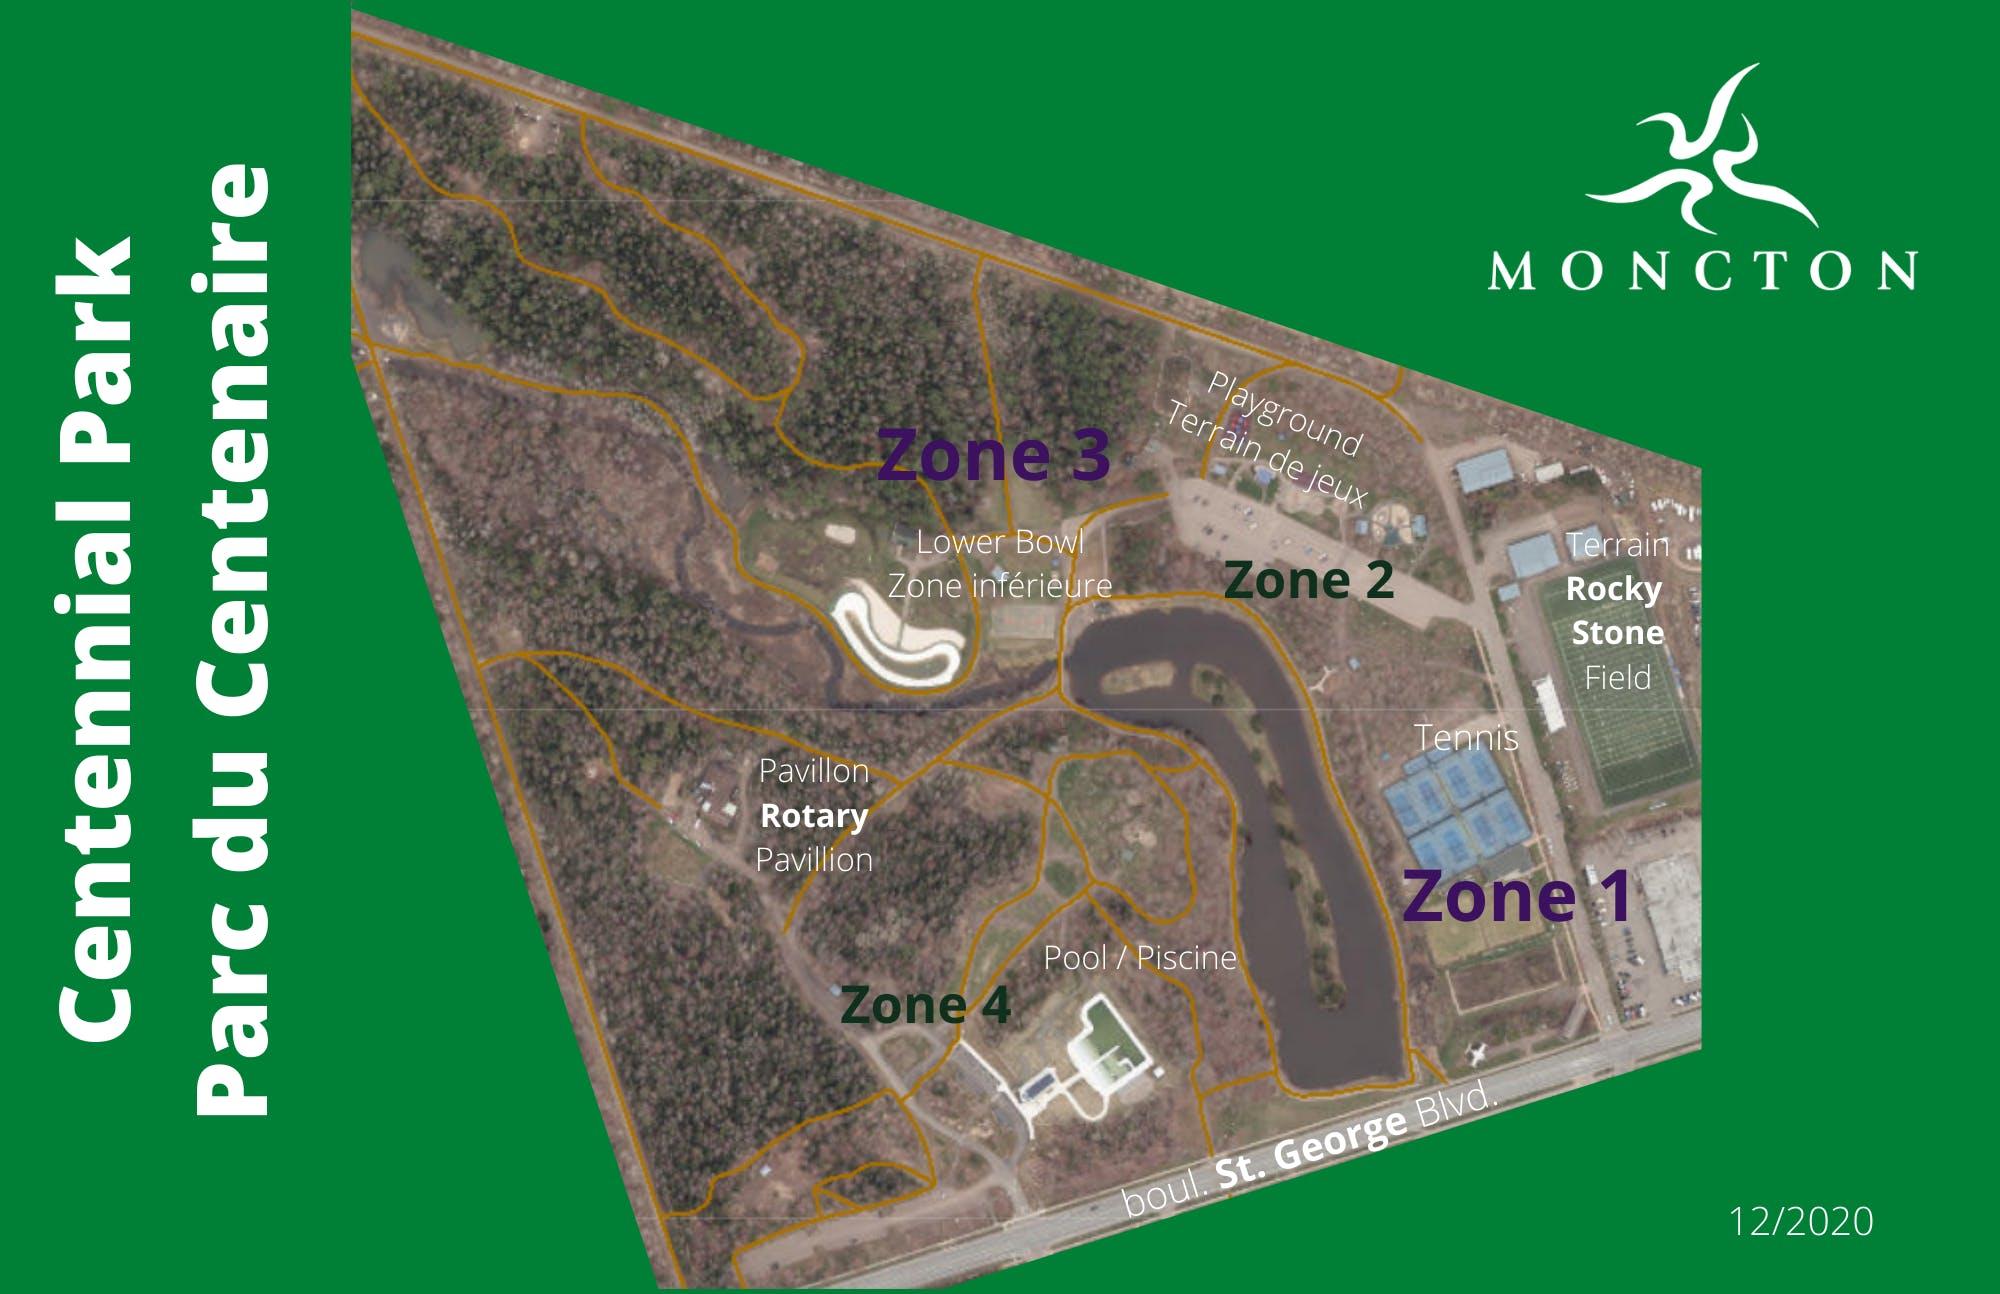 Centennial Park (zones)